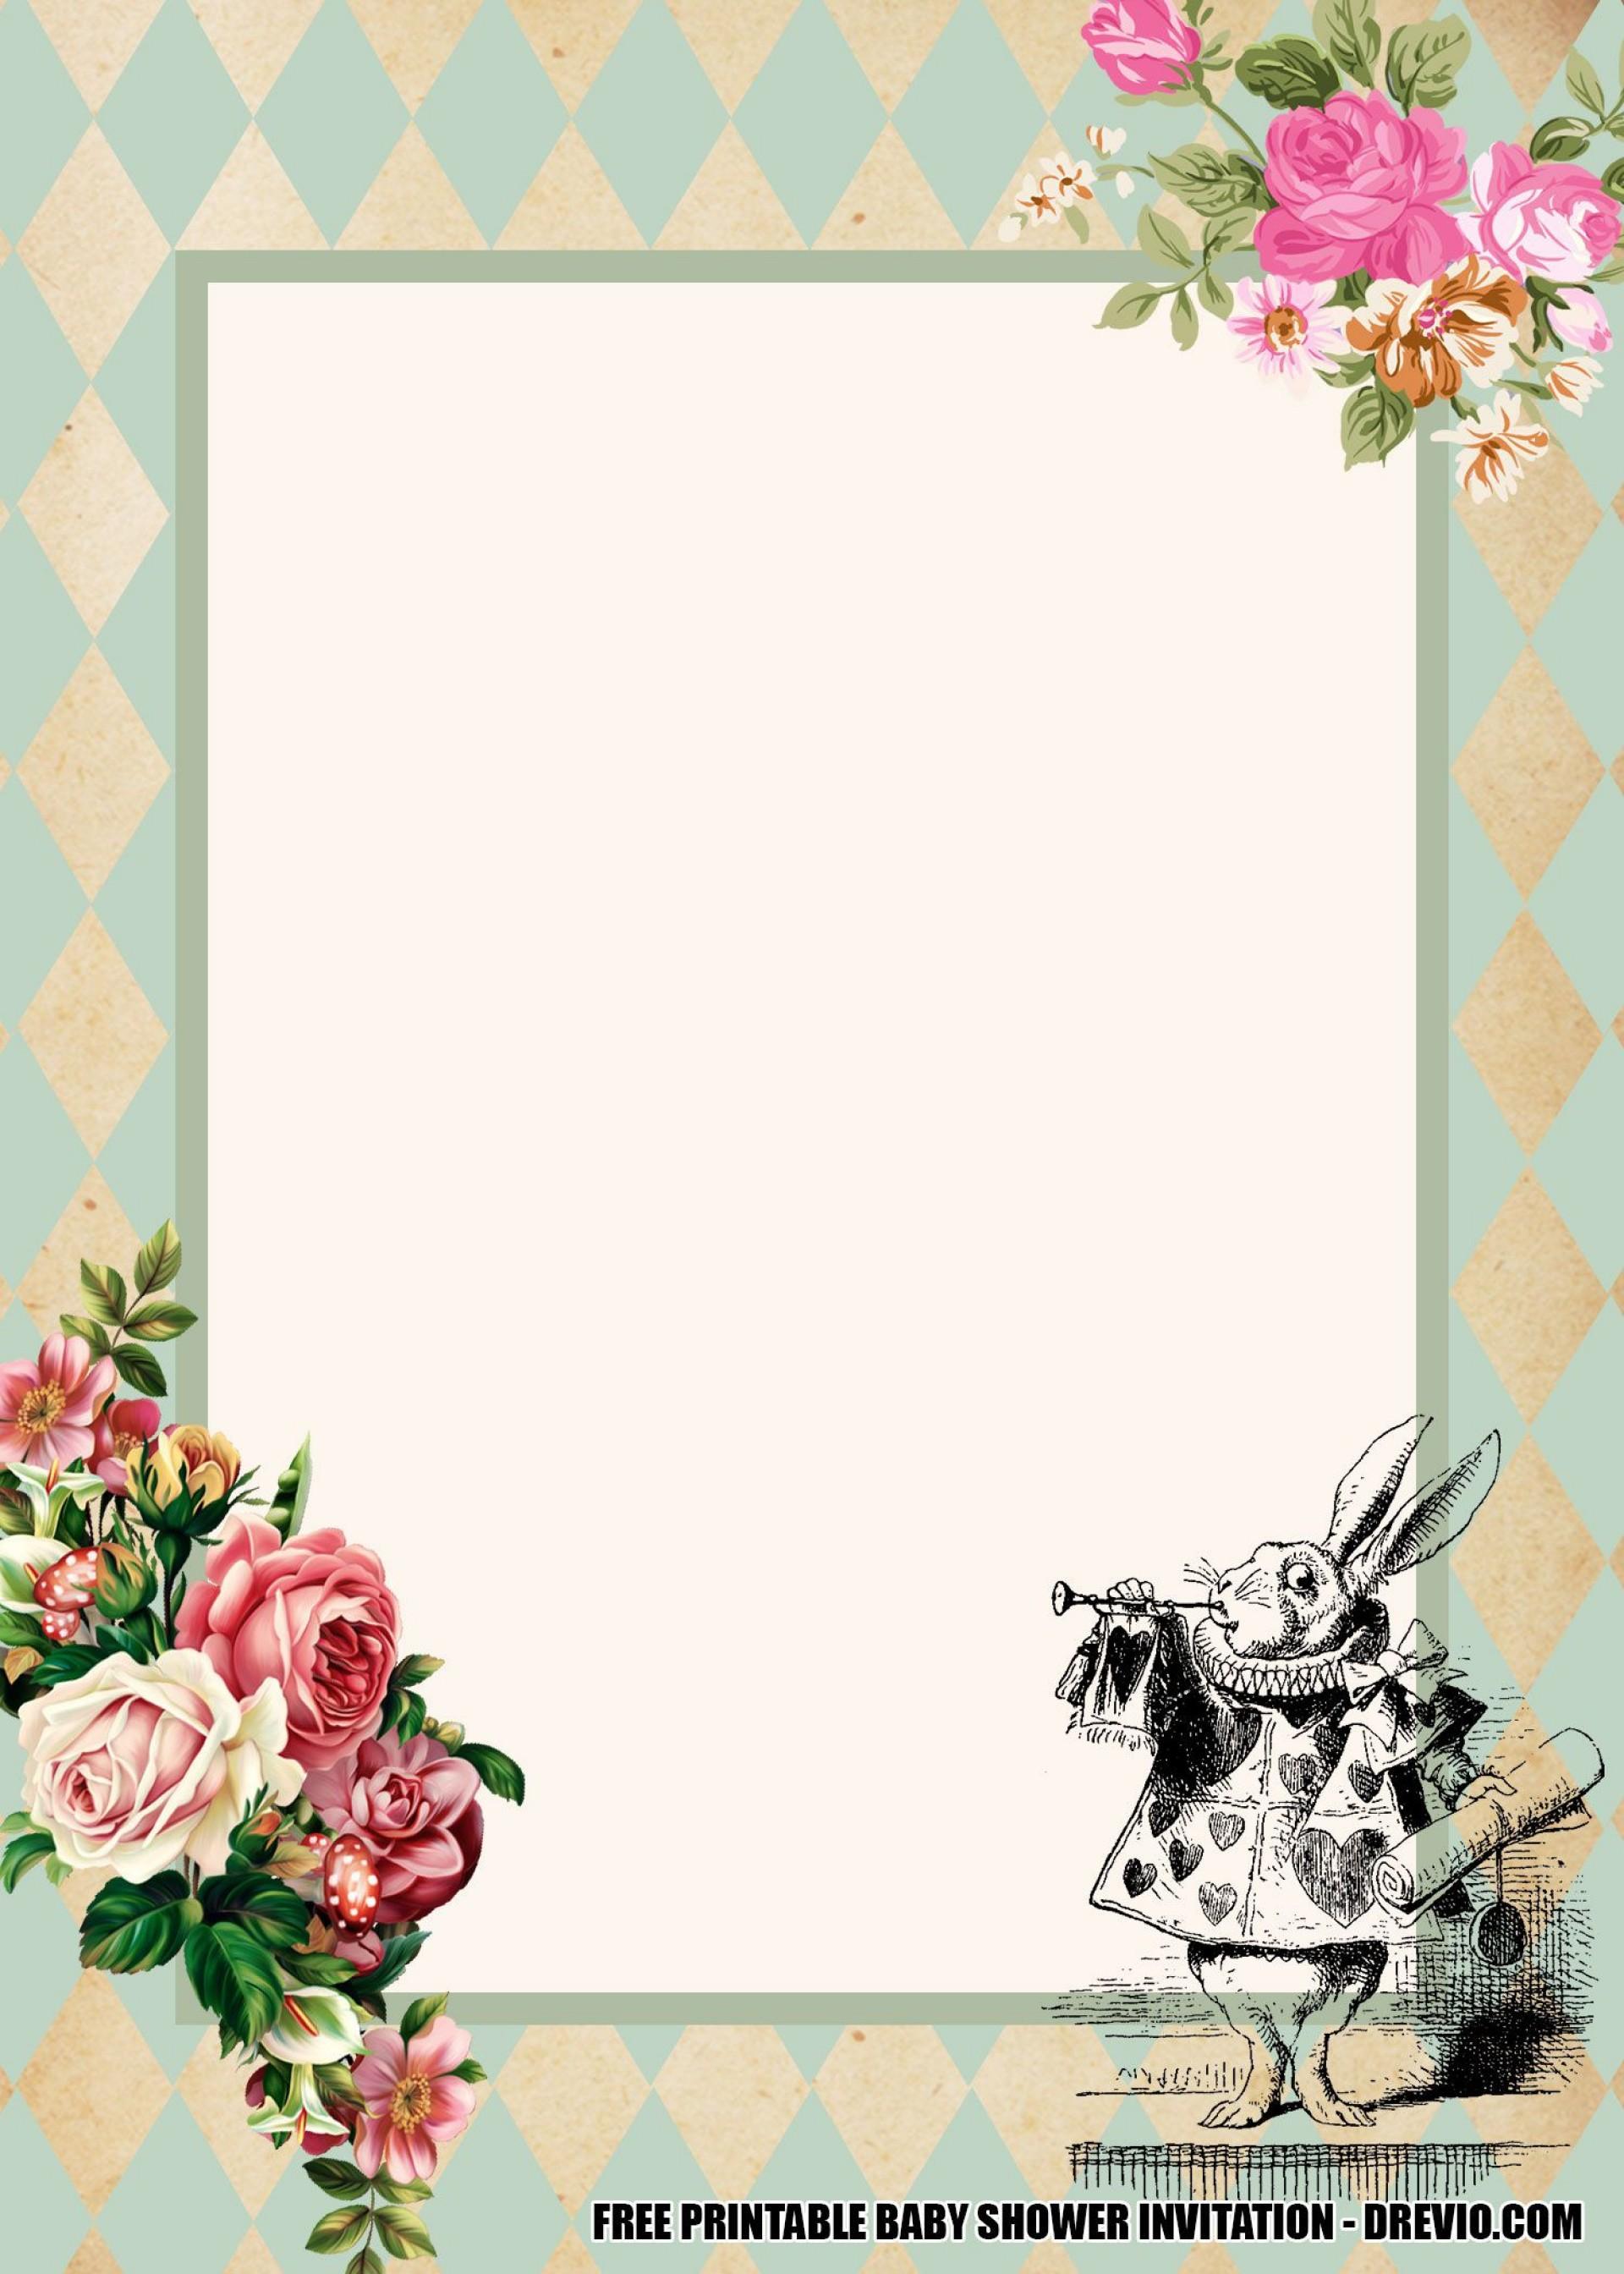 006 Unusual Alice In Wonderland Invitation Template Image  Templates Wedding Birthday Free Tea Party1920